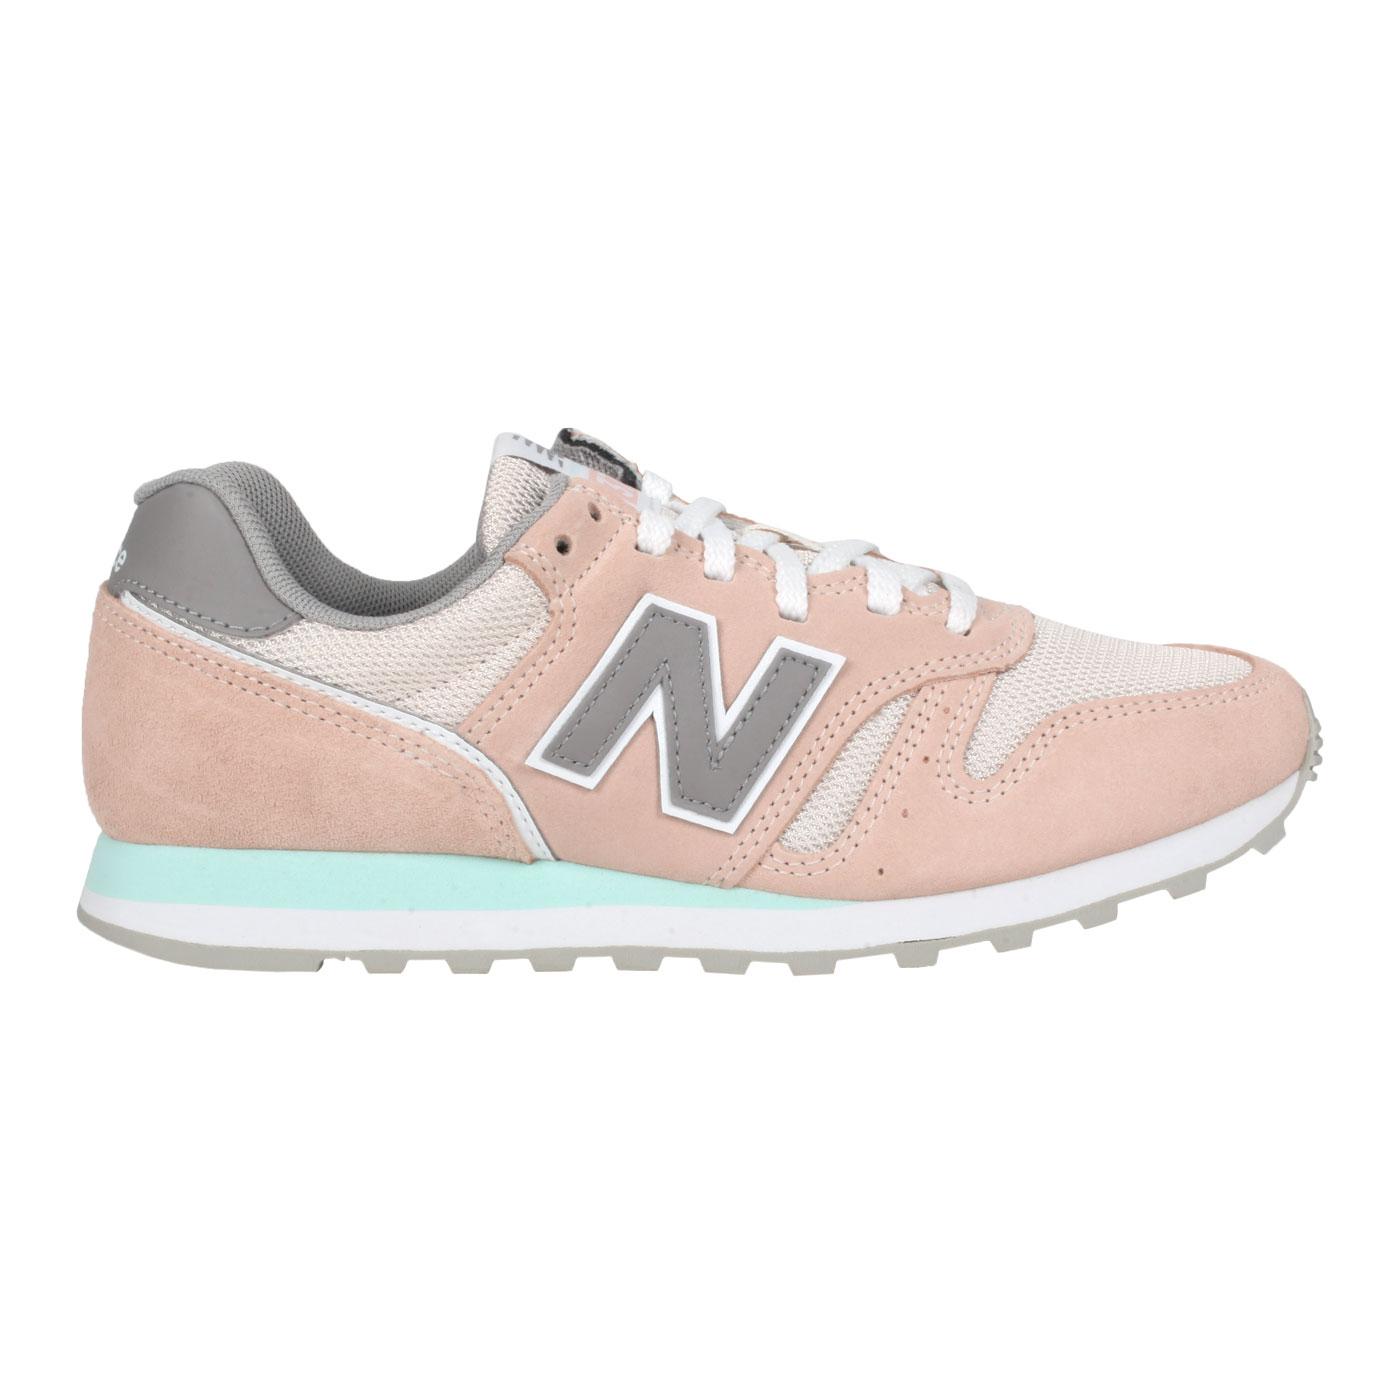 NEW BALANCE 女款休閒運動鞋 WL373CP2 - 粉橘灰綠